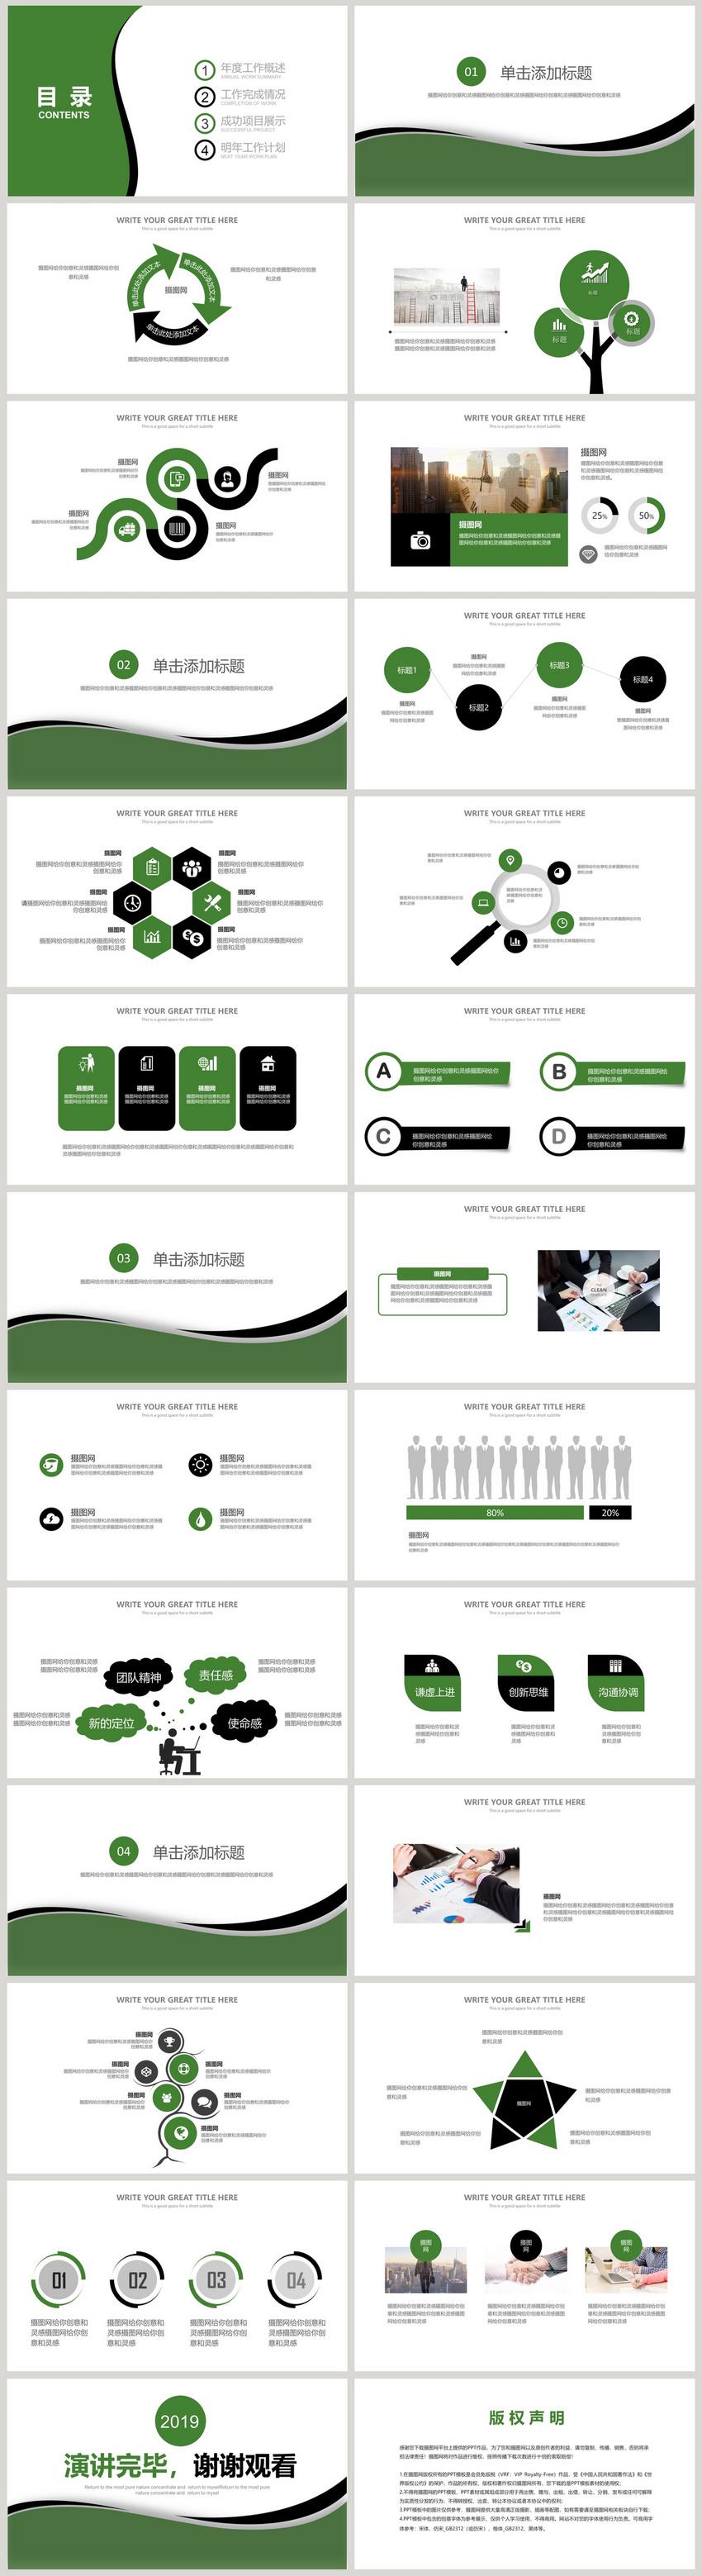 Fesyen Ringkas Laporan Akademik Template Ppt Powerpoint Slide Persembahan 400094693 My Lovepik Com Ppt